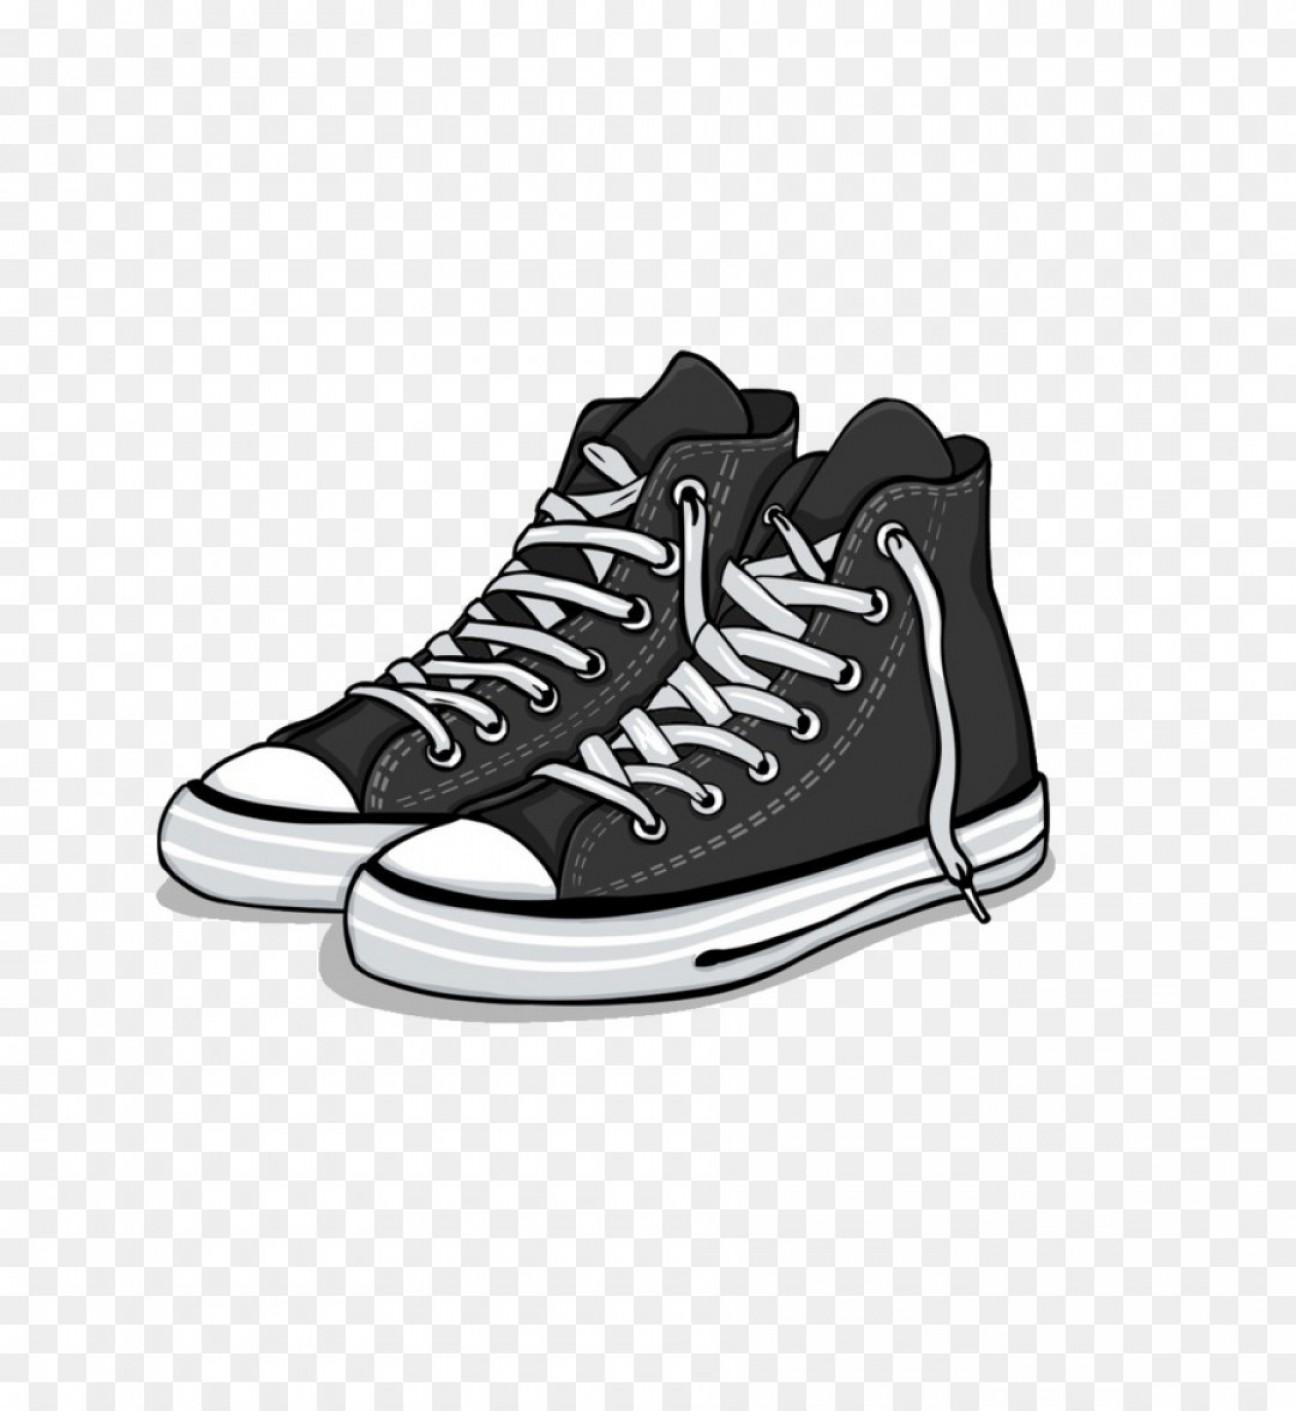 Png Shoe Converse Sneakers Canvas Shoes.